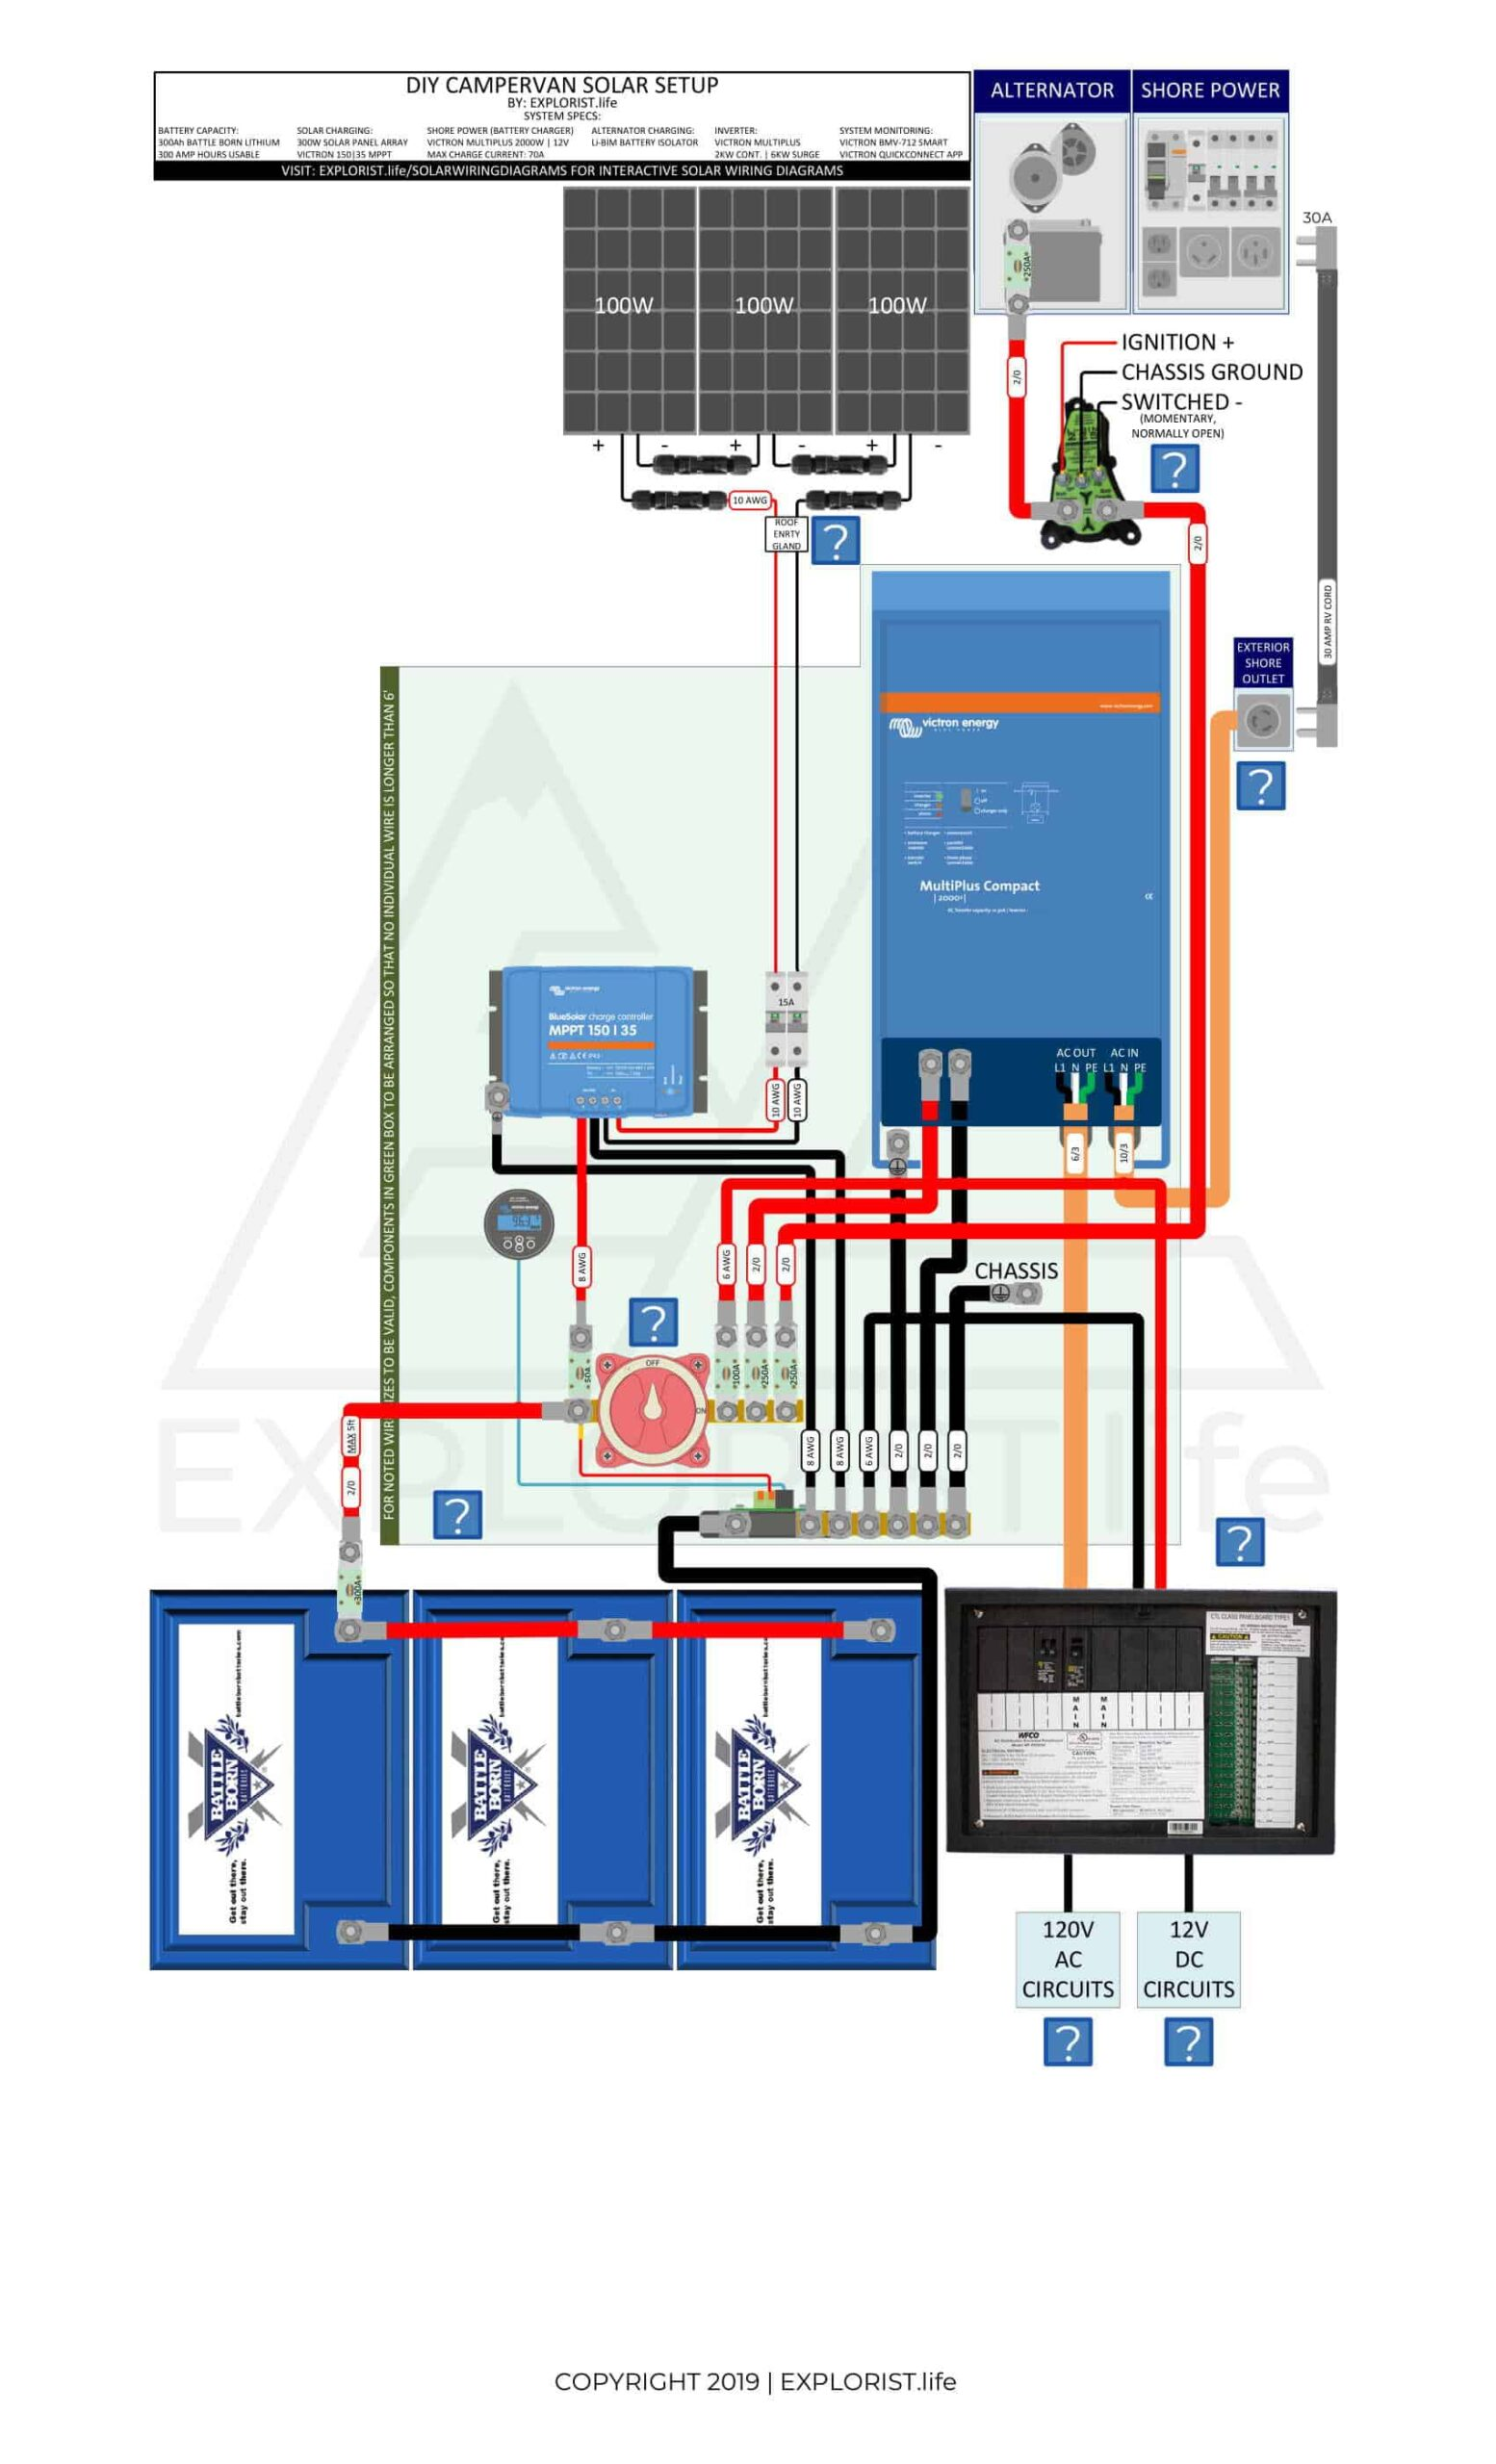 300Ah Lithium Battery Bank – 3x100W Solar – 2kW Inverter/Charger – Li-BIM Alternator Charging